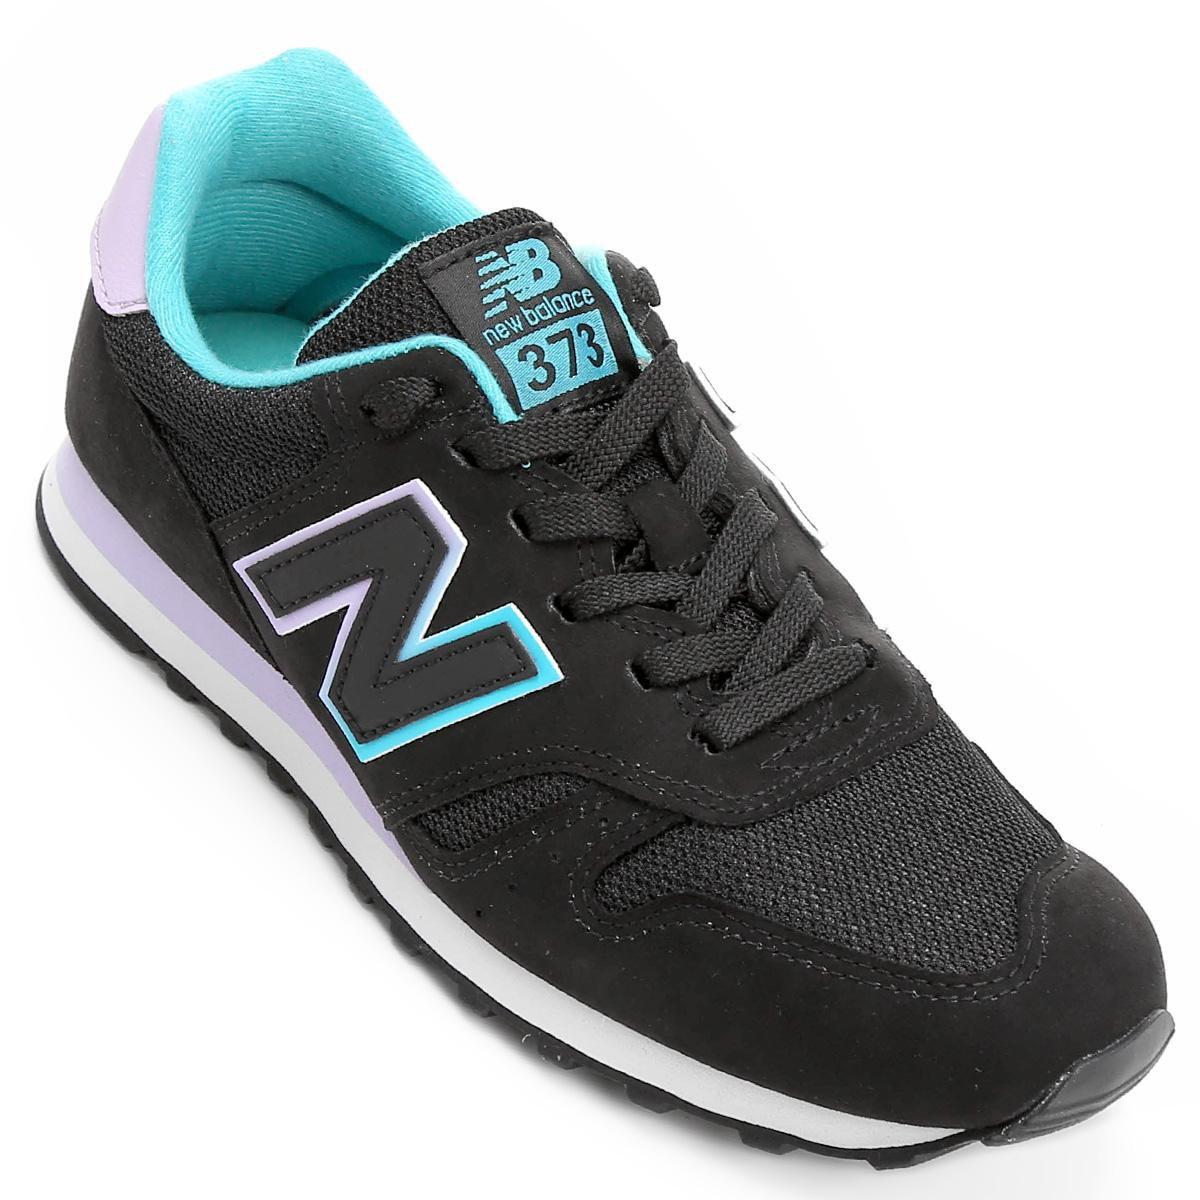 80eb94833 usa new balance 574 82517 b9cd0; reduced tênis new balance w 373 core  classic feminino pretolilás 487ff 4d838